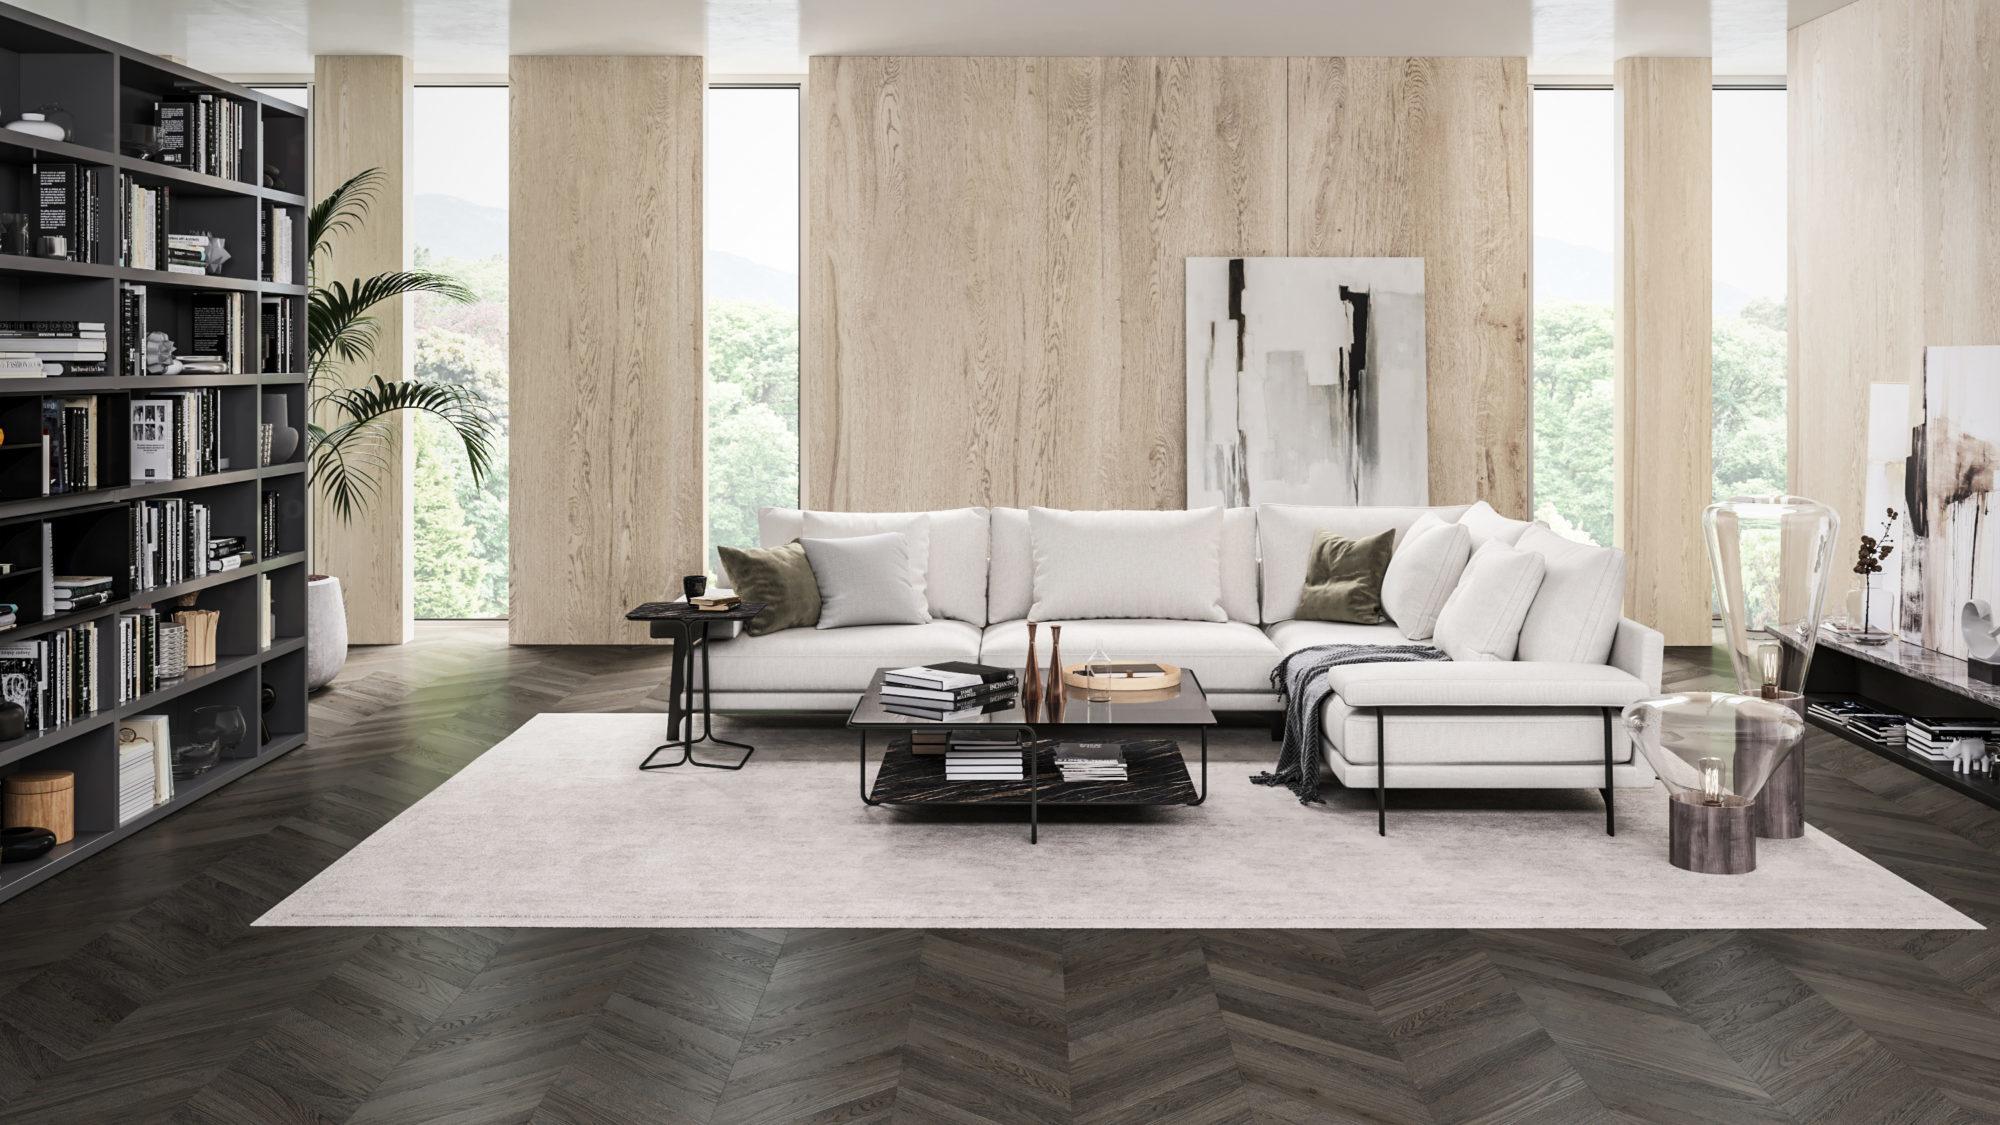 Sofa do salonu – jaki kolor wybrać?